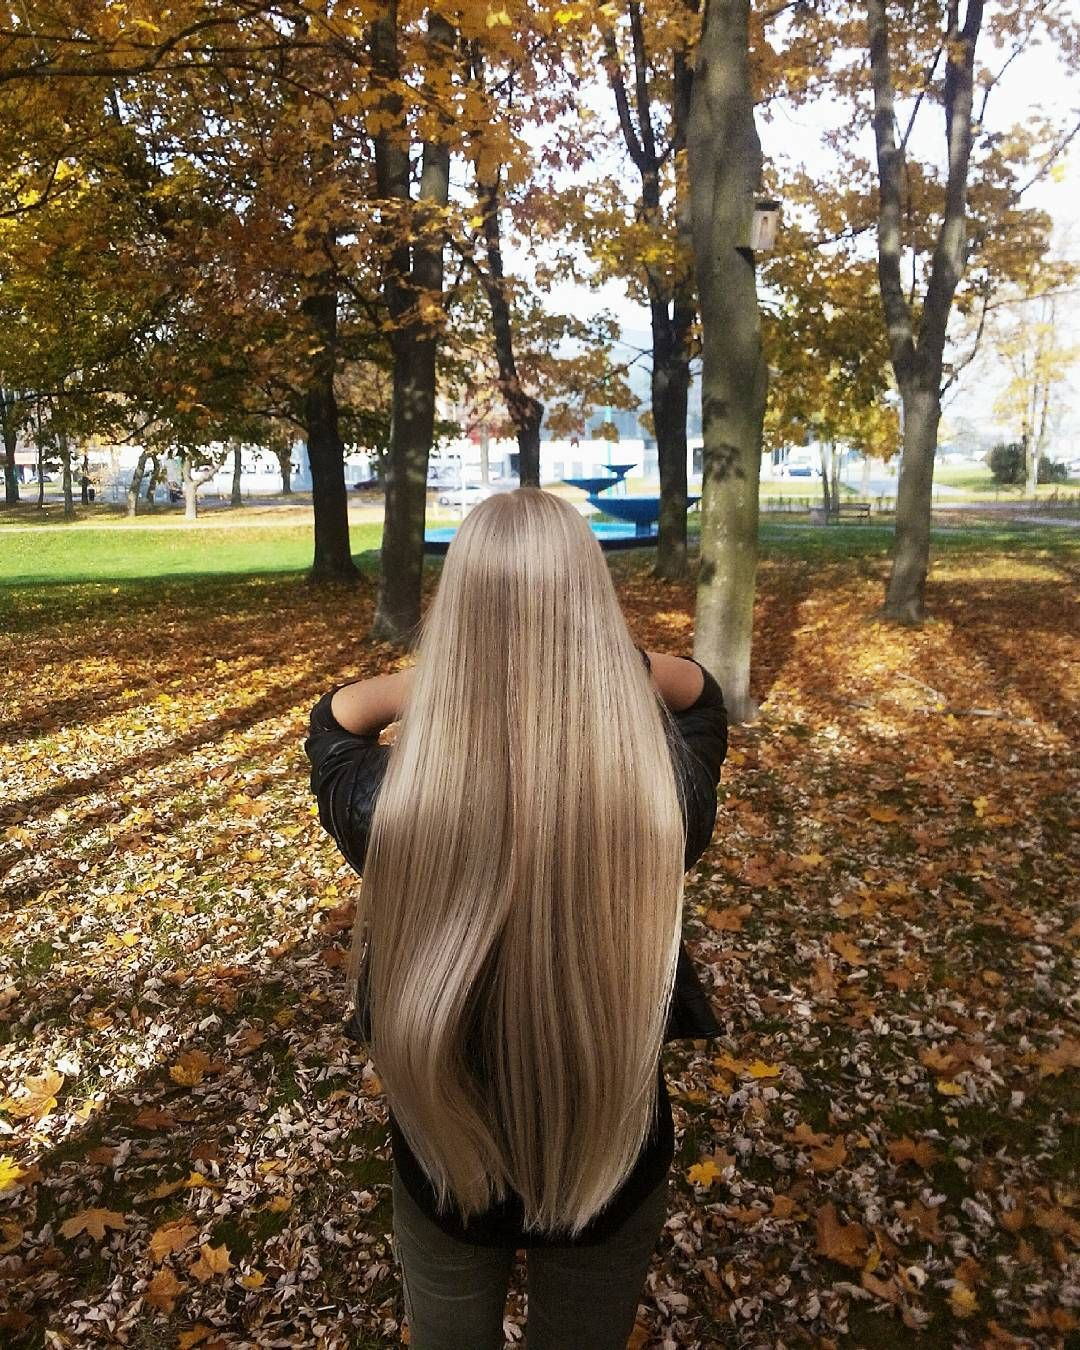 "72 Likes, 9 Comments - Long Hair Expert (@long.hair.expert) on Instagram: ""#autumn #beautiful #hair #haircare #hairobsessed #longhair #verylonghair #blondehair #blondeme #me…"""